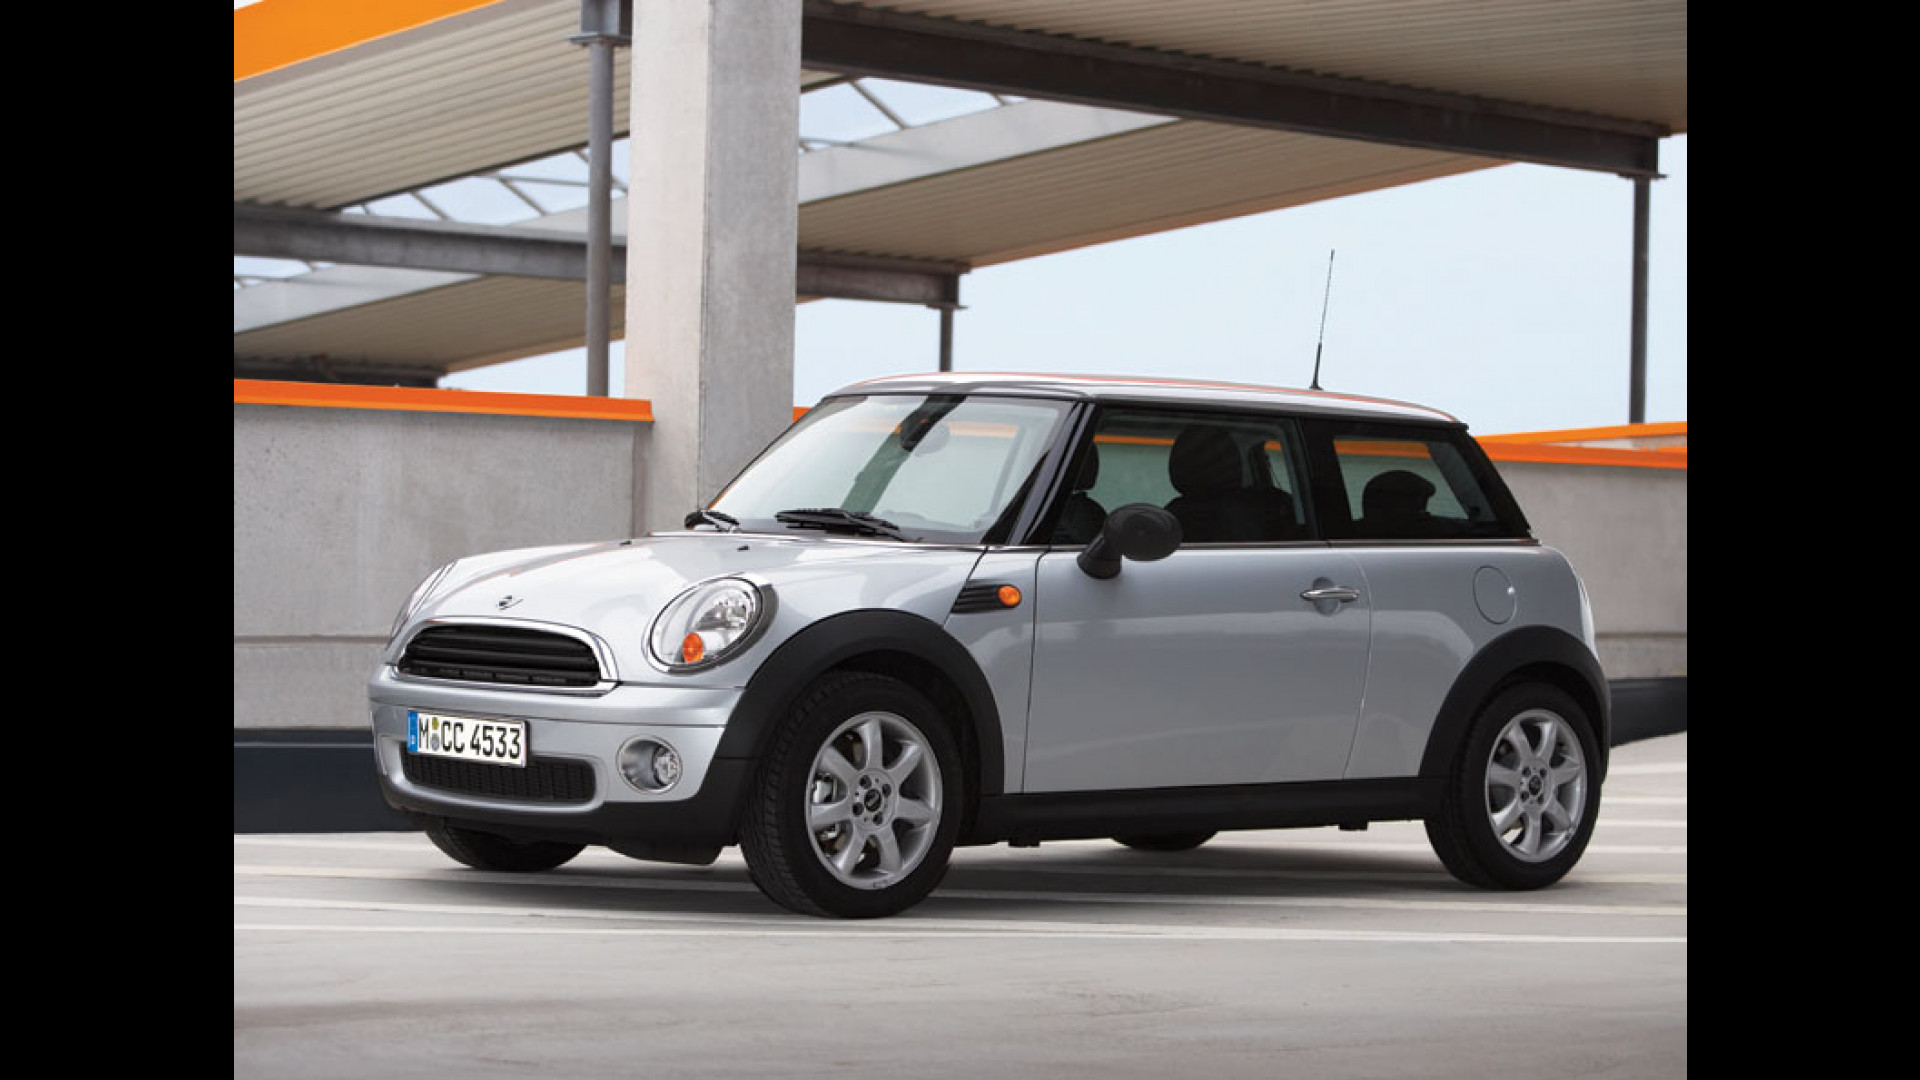 Le Nuove Mini One E Mini Cooper D